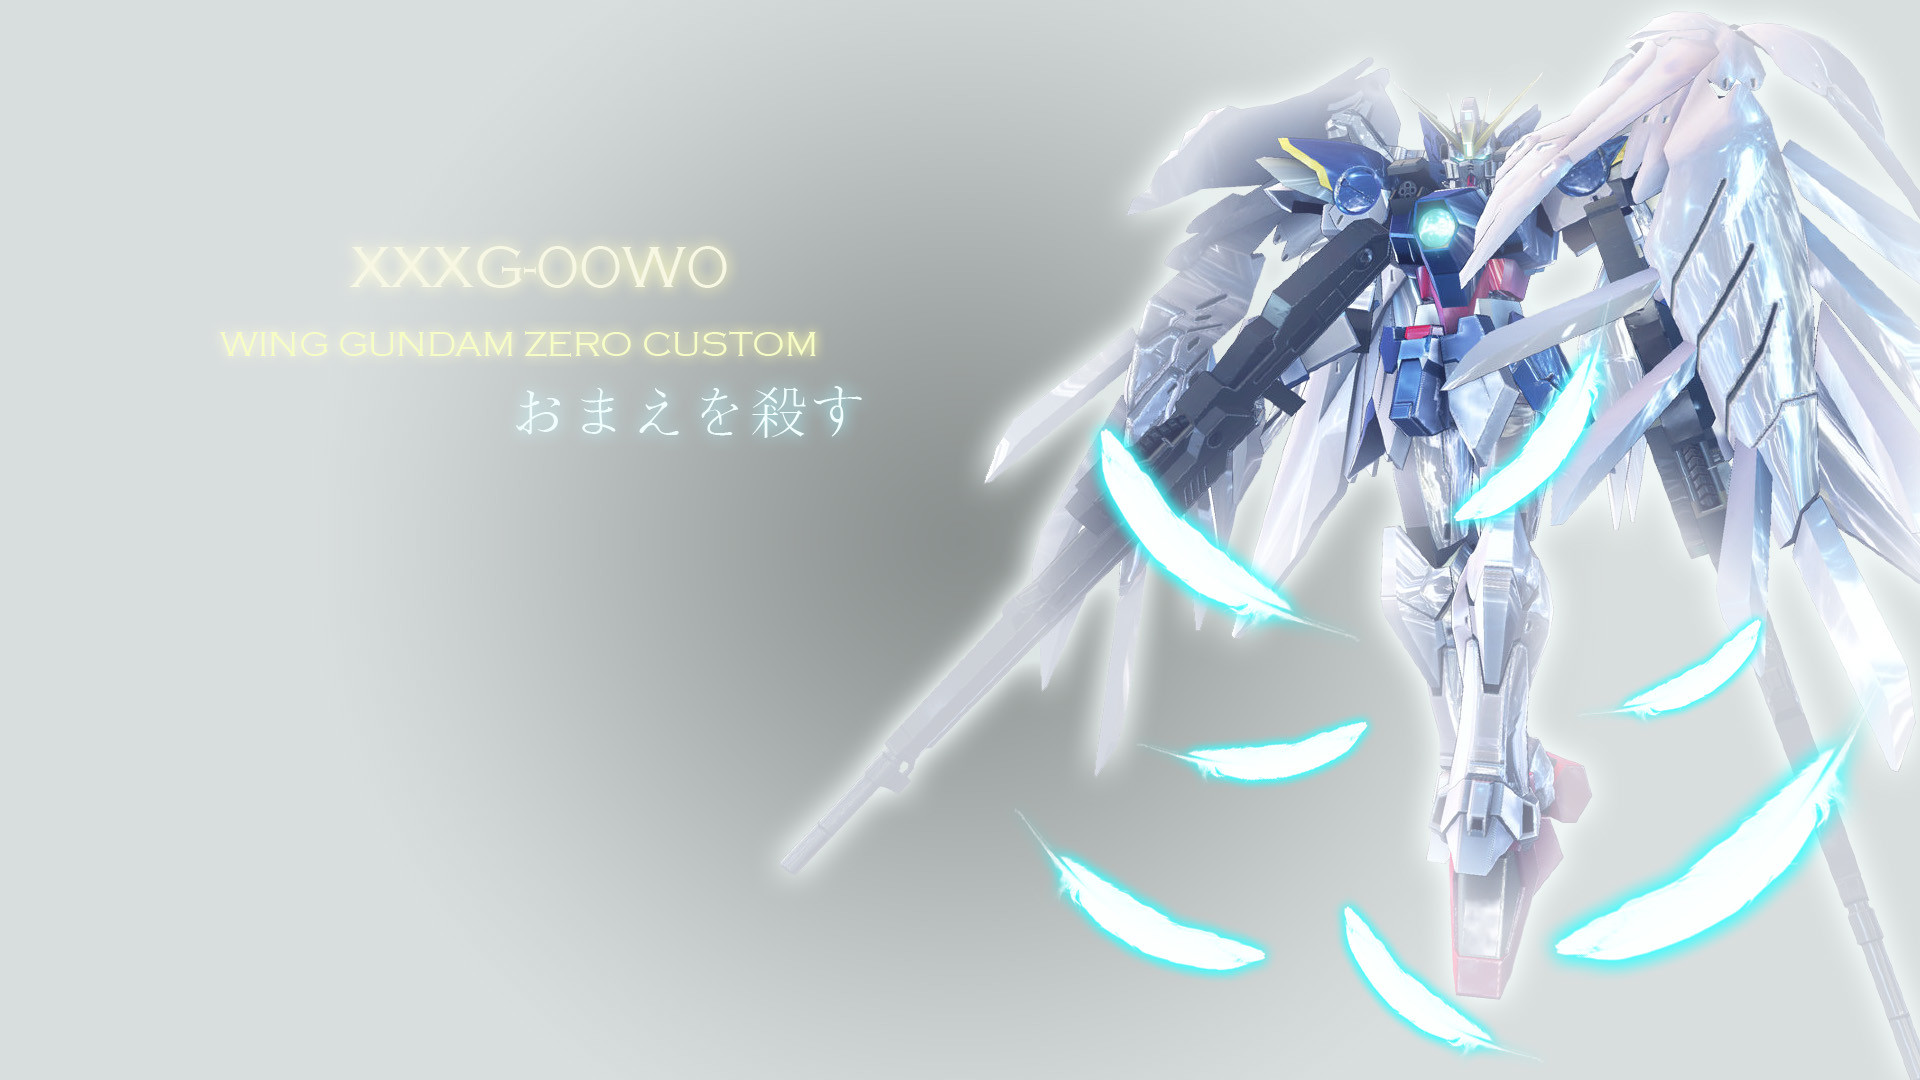 Mobile Suit Gundam Wing · download Mobile Suit Gundam Wing image